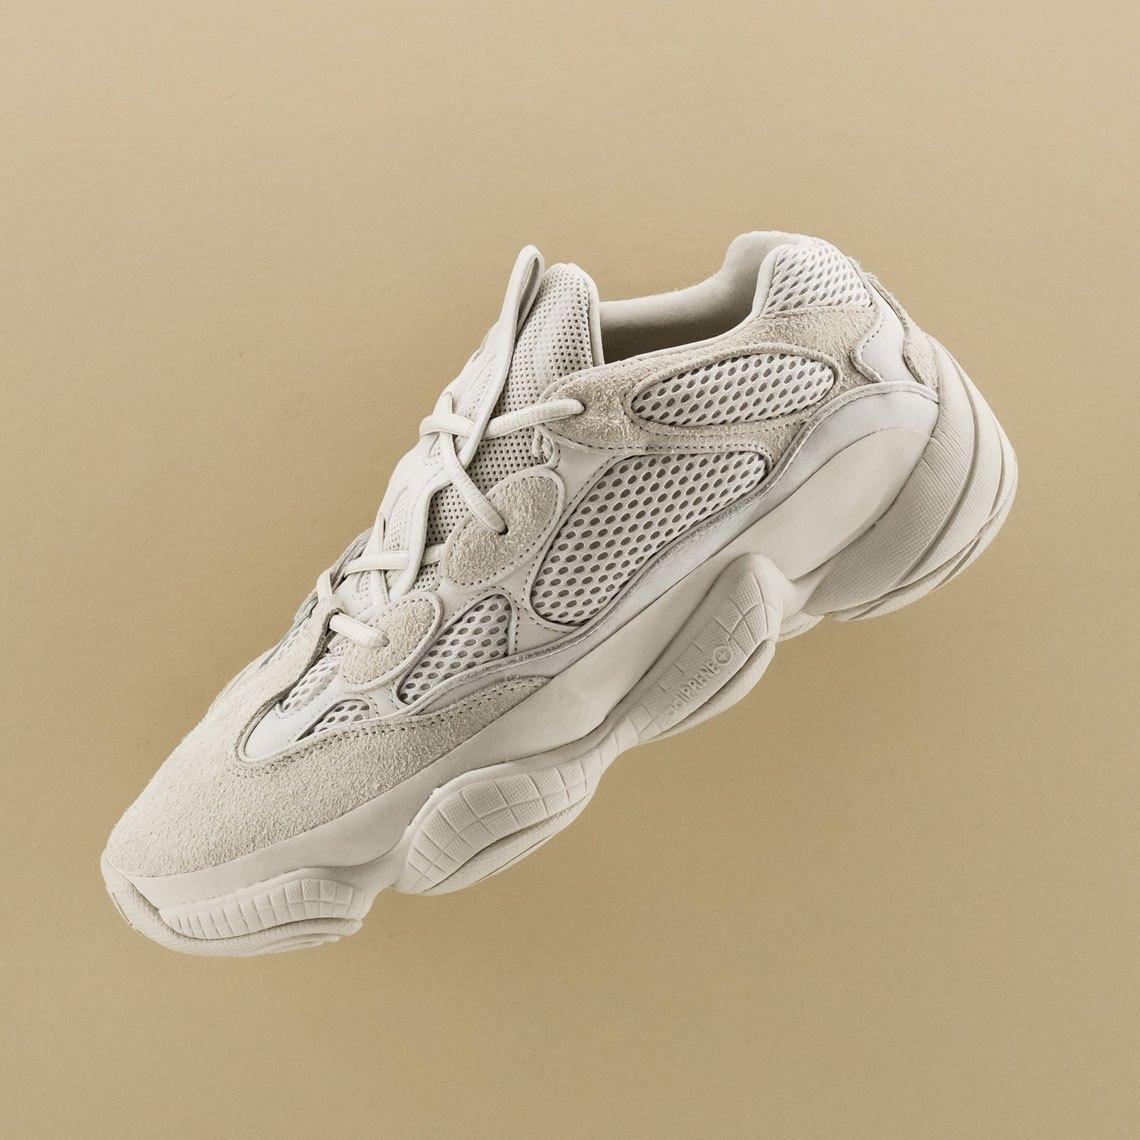 Acquista miglior prezzo scarpe adidas yeezy 500  3ef392a3424